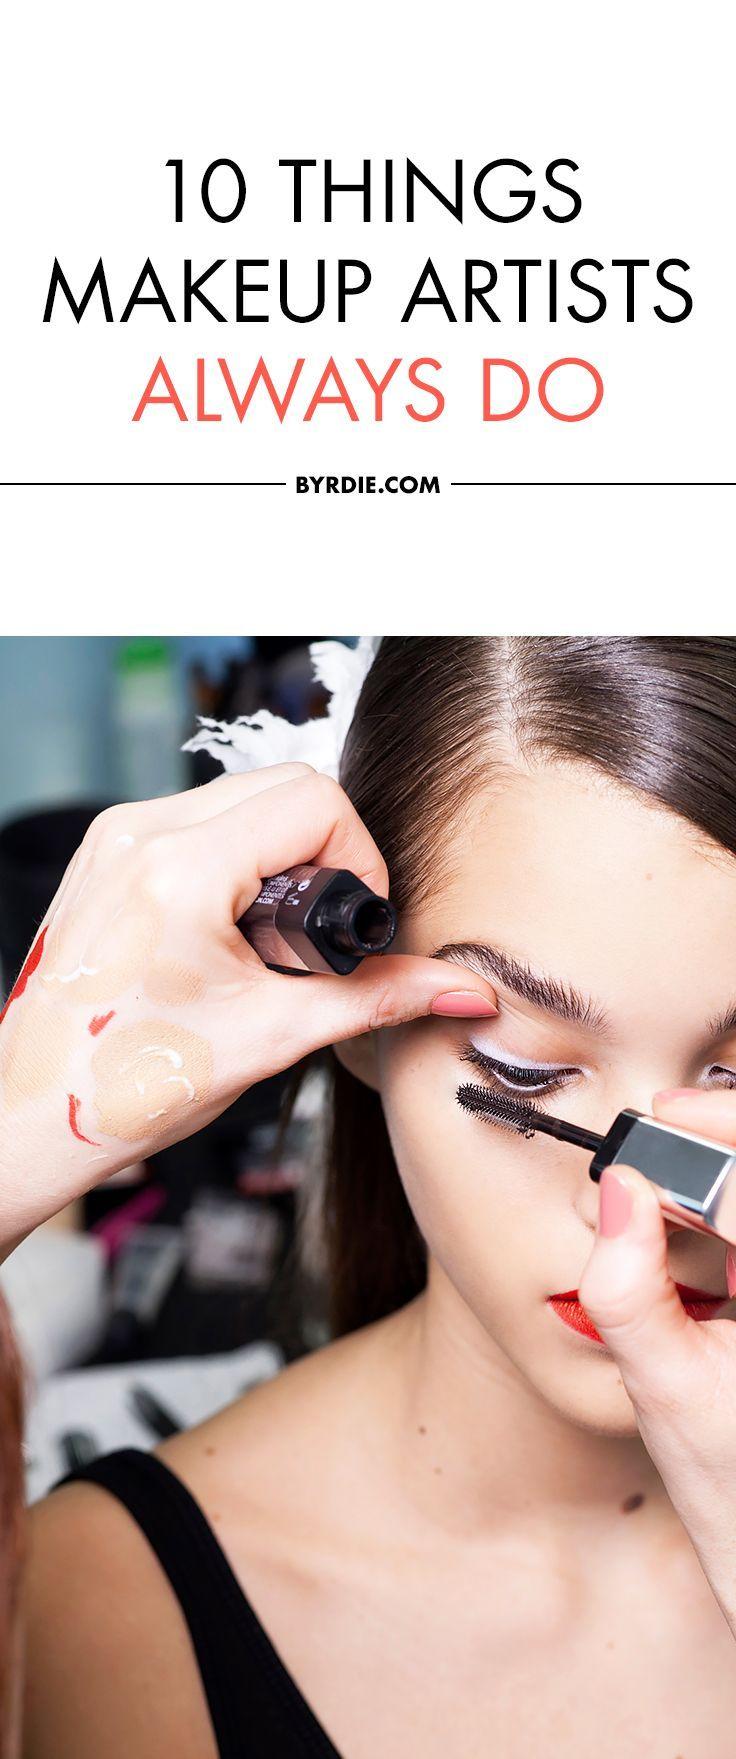 skills needed for makeup artist